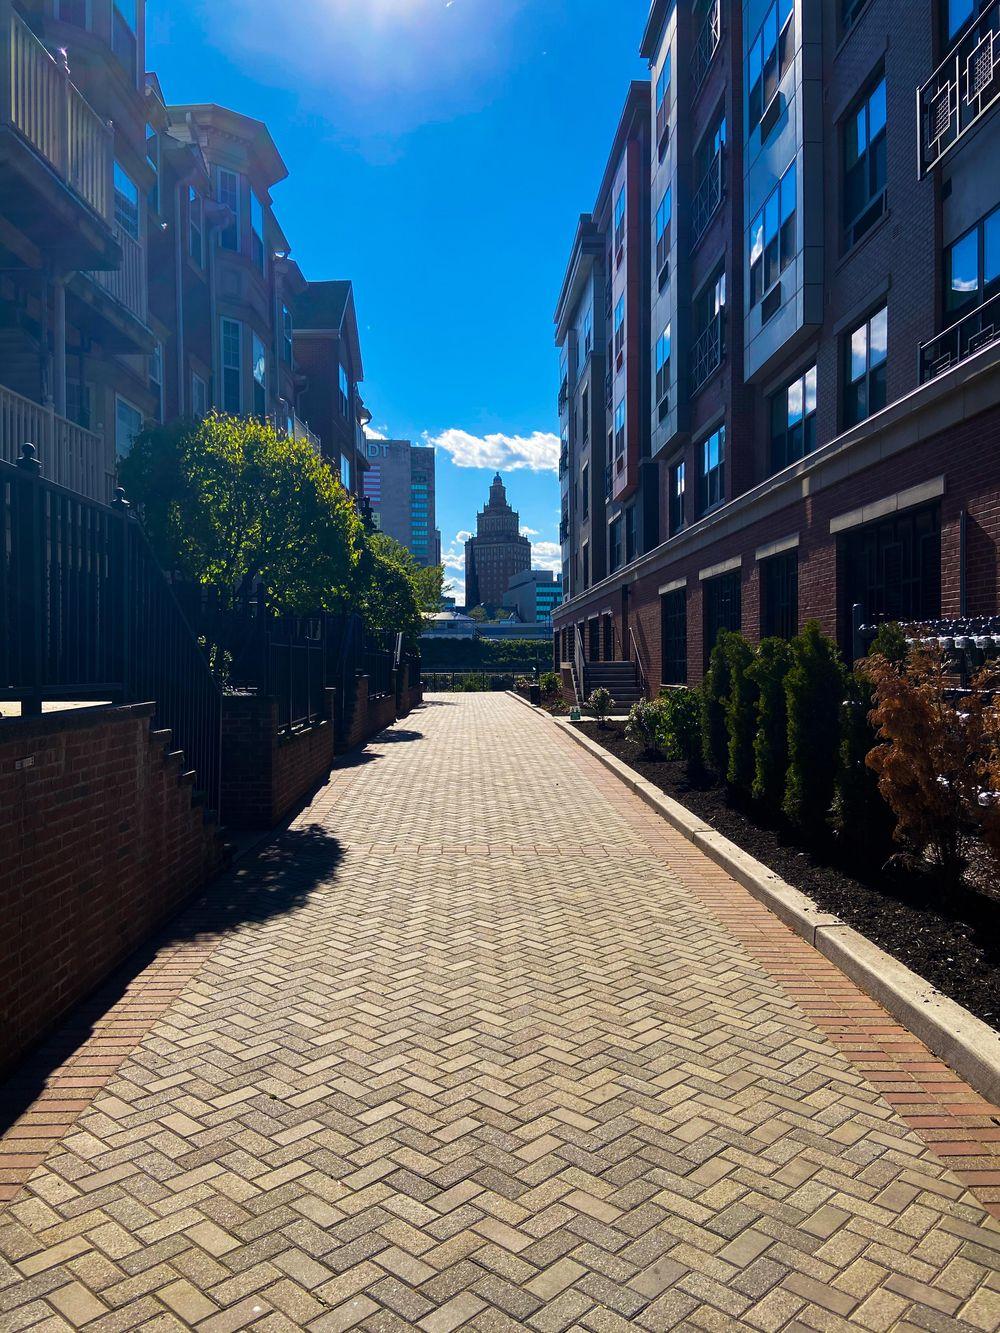 Eye into Newark - image 2 - student project